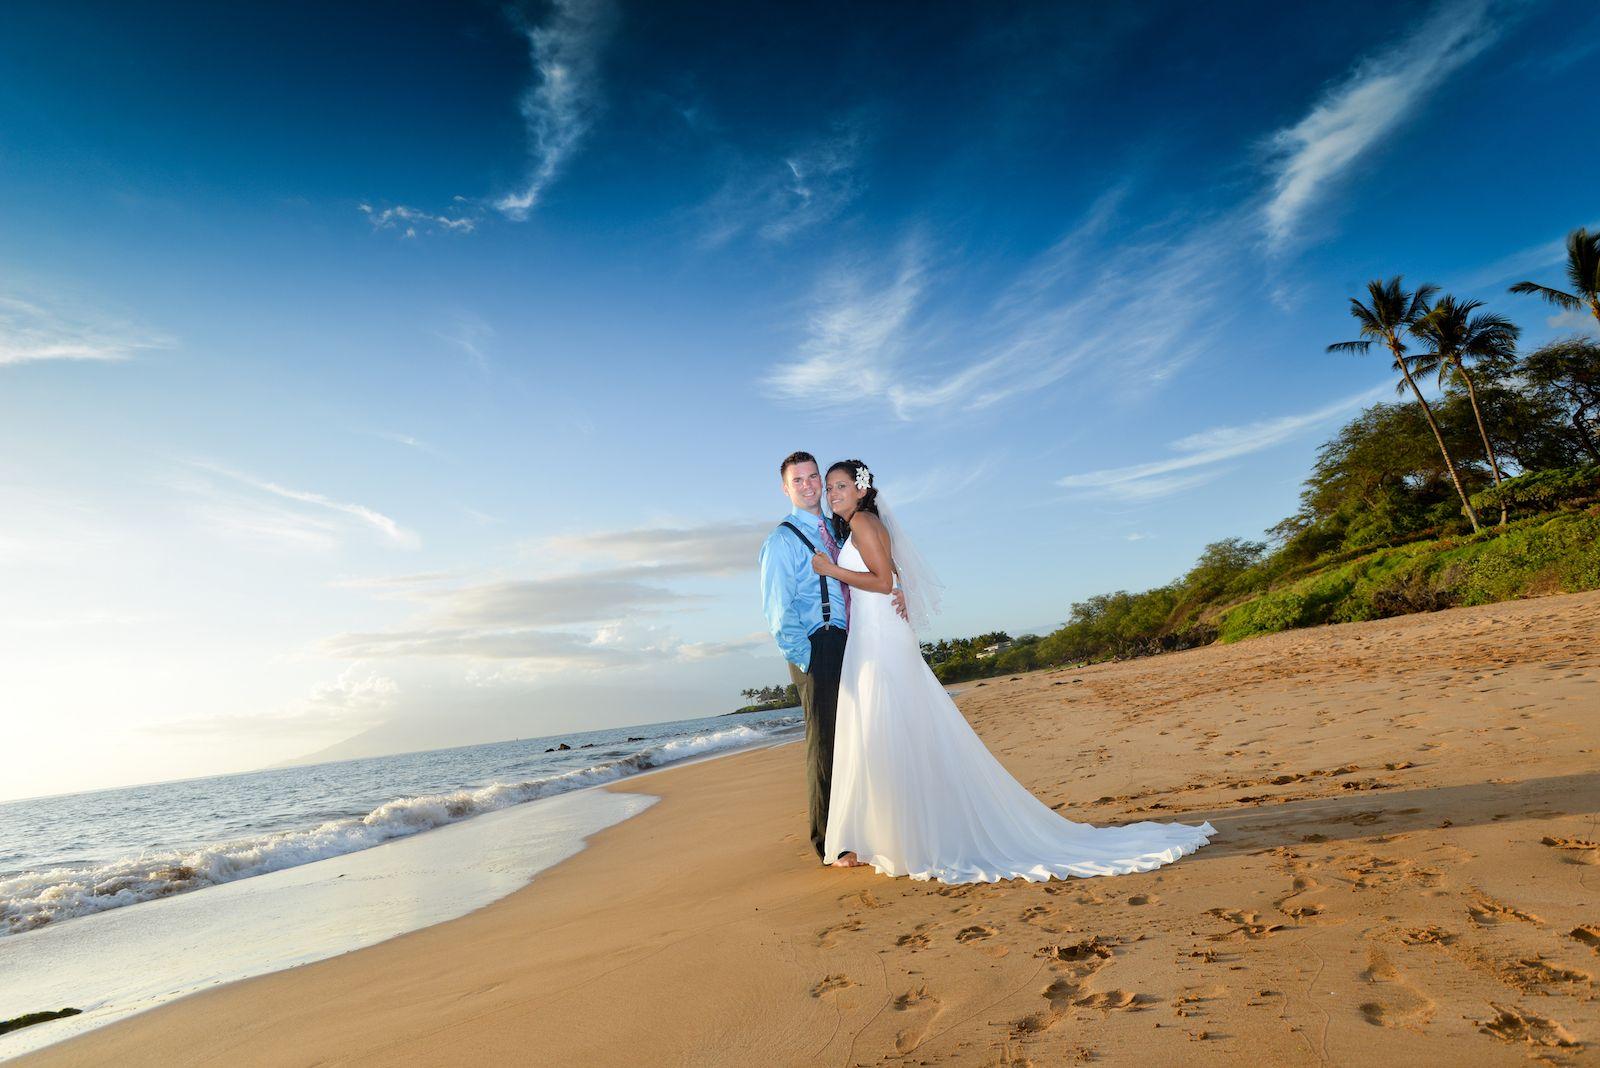 Maui & Big Island Beach Weddings & Vow Renewals - Stress Free ...